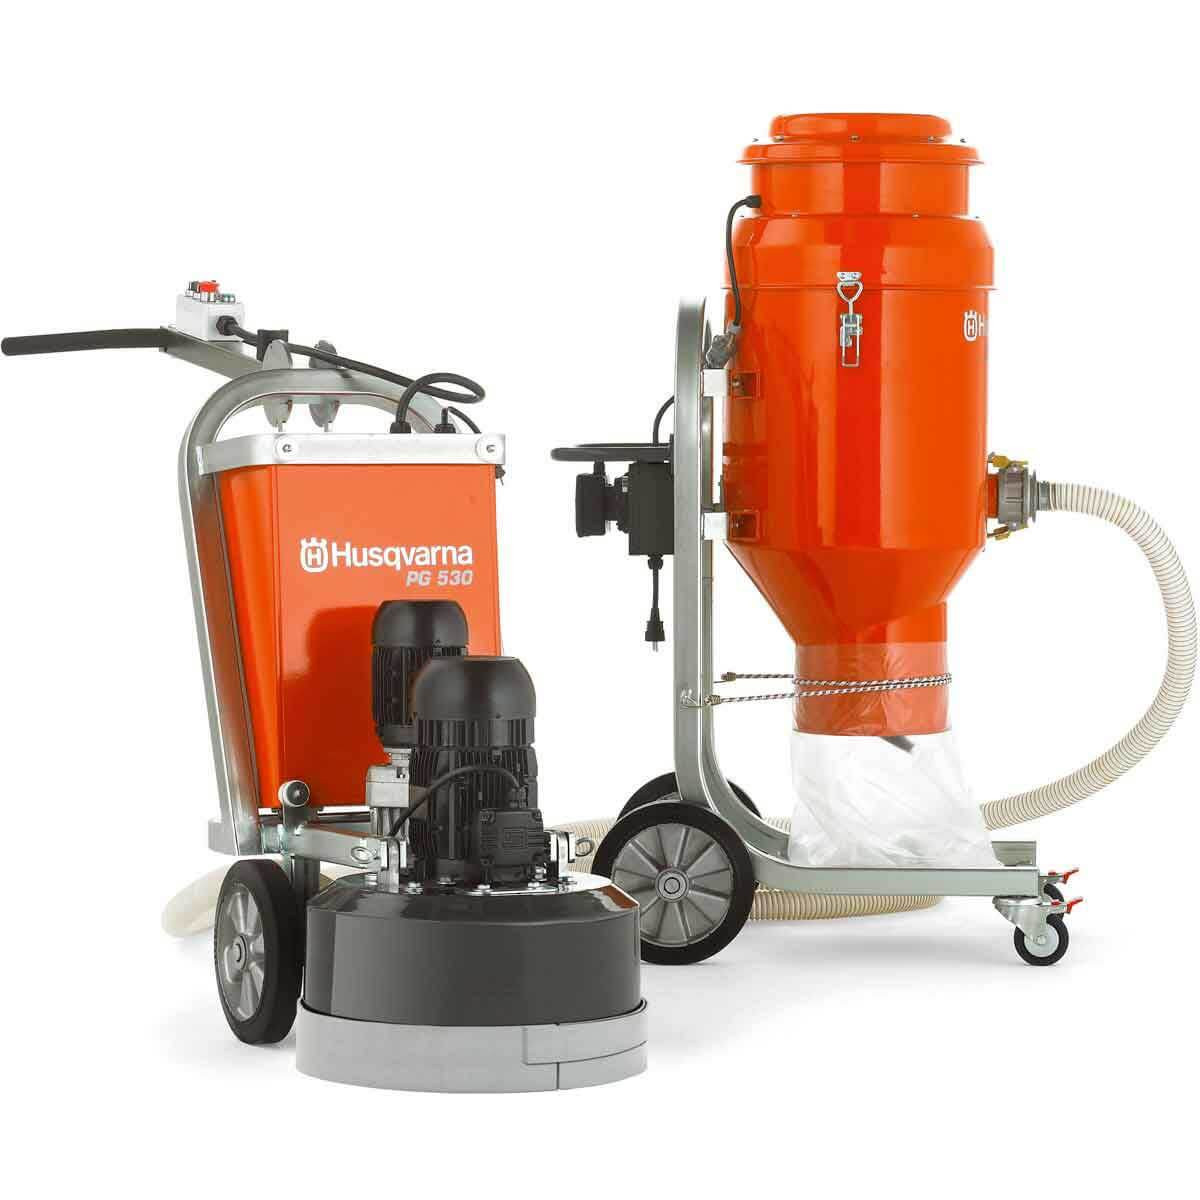 Husqvarna PG 530 grinder vacuum